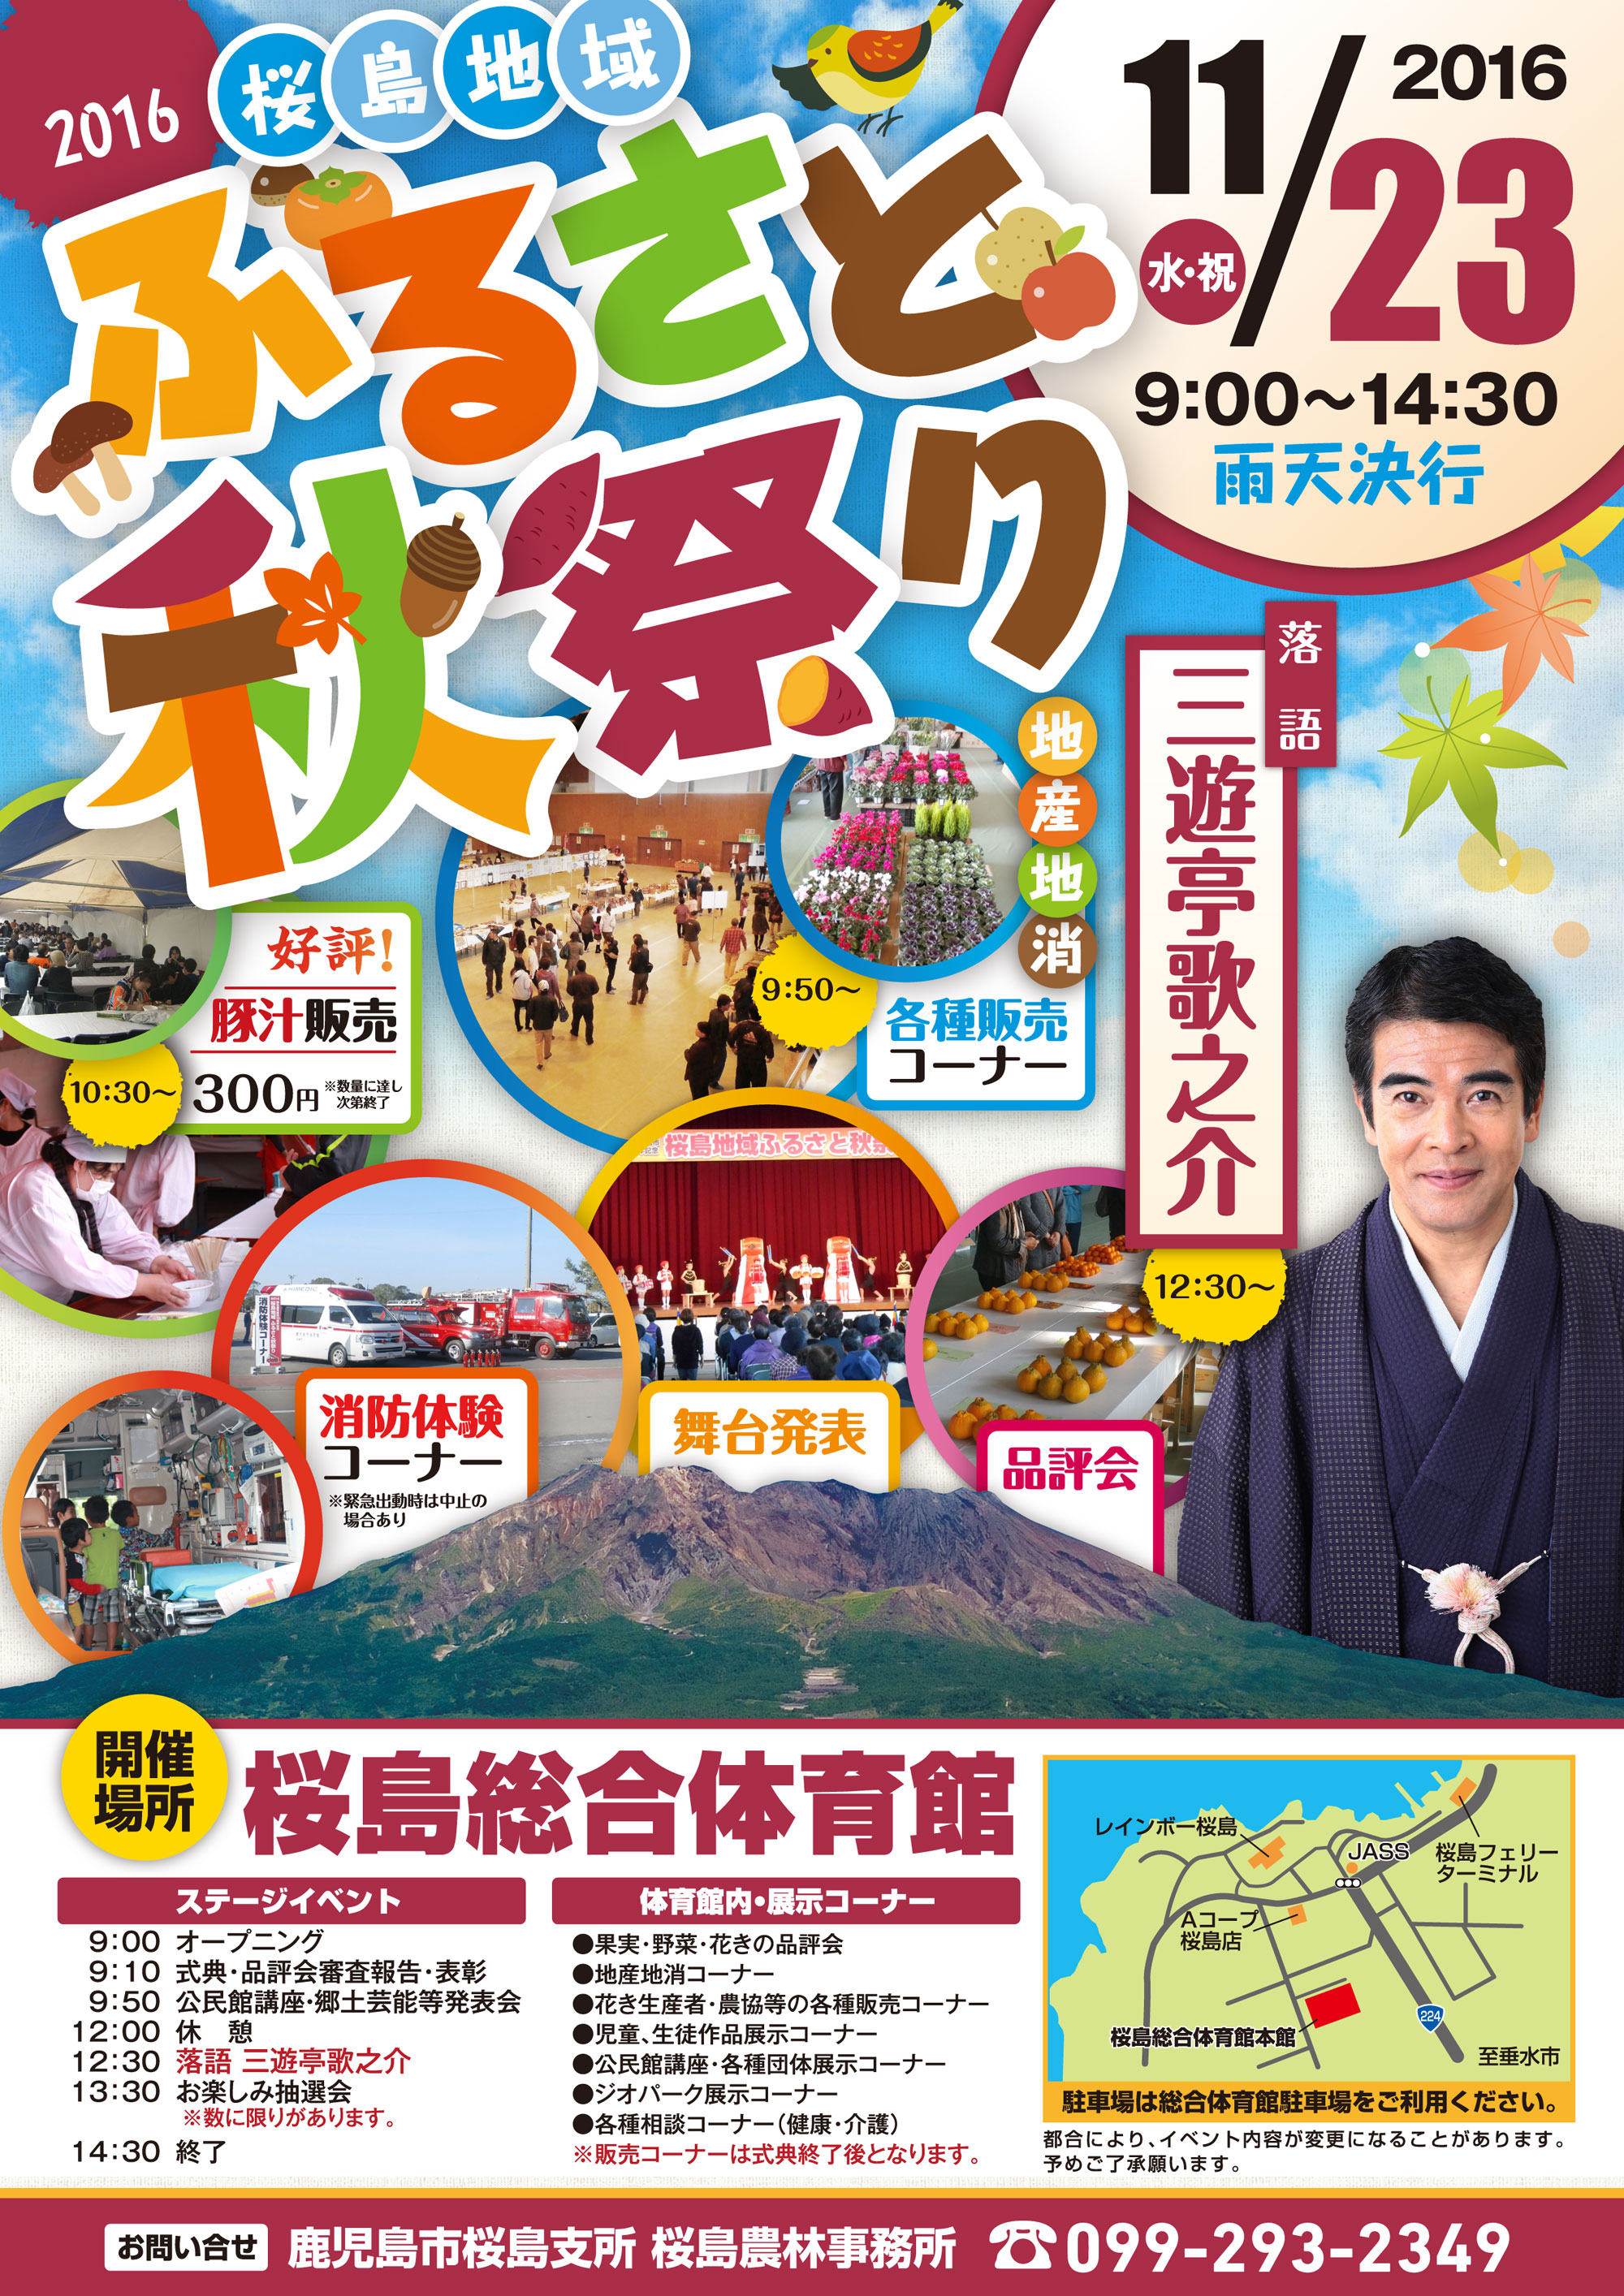 http://www.sakurajima.gr.jp/images/2016_furusatoakimatsuri01.jpeg